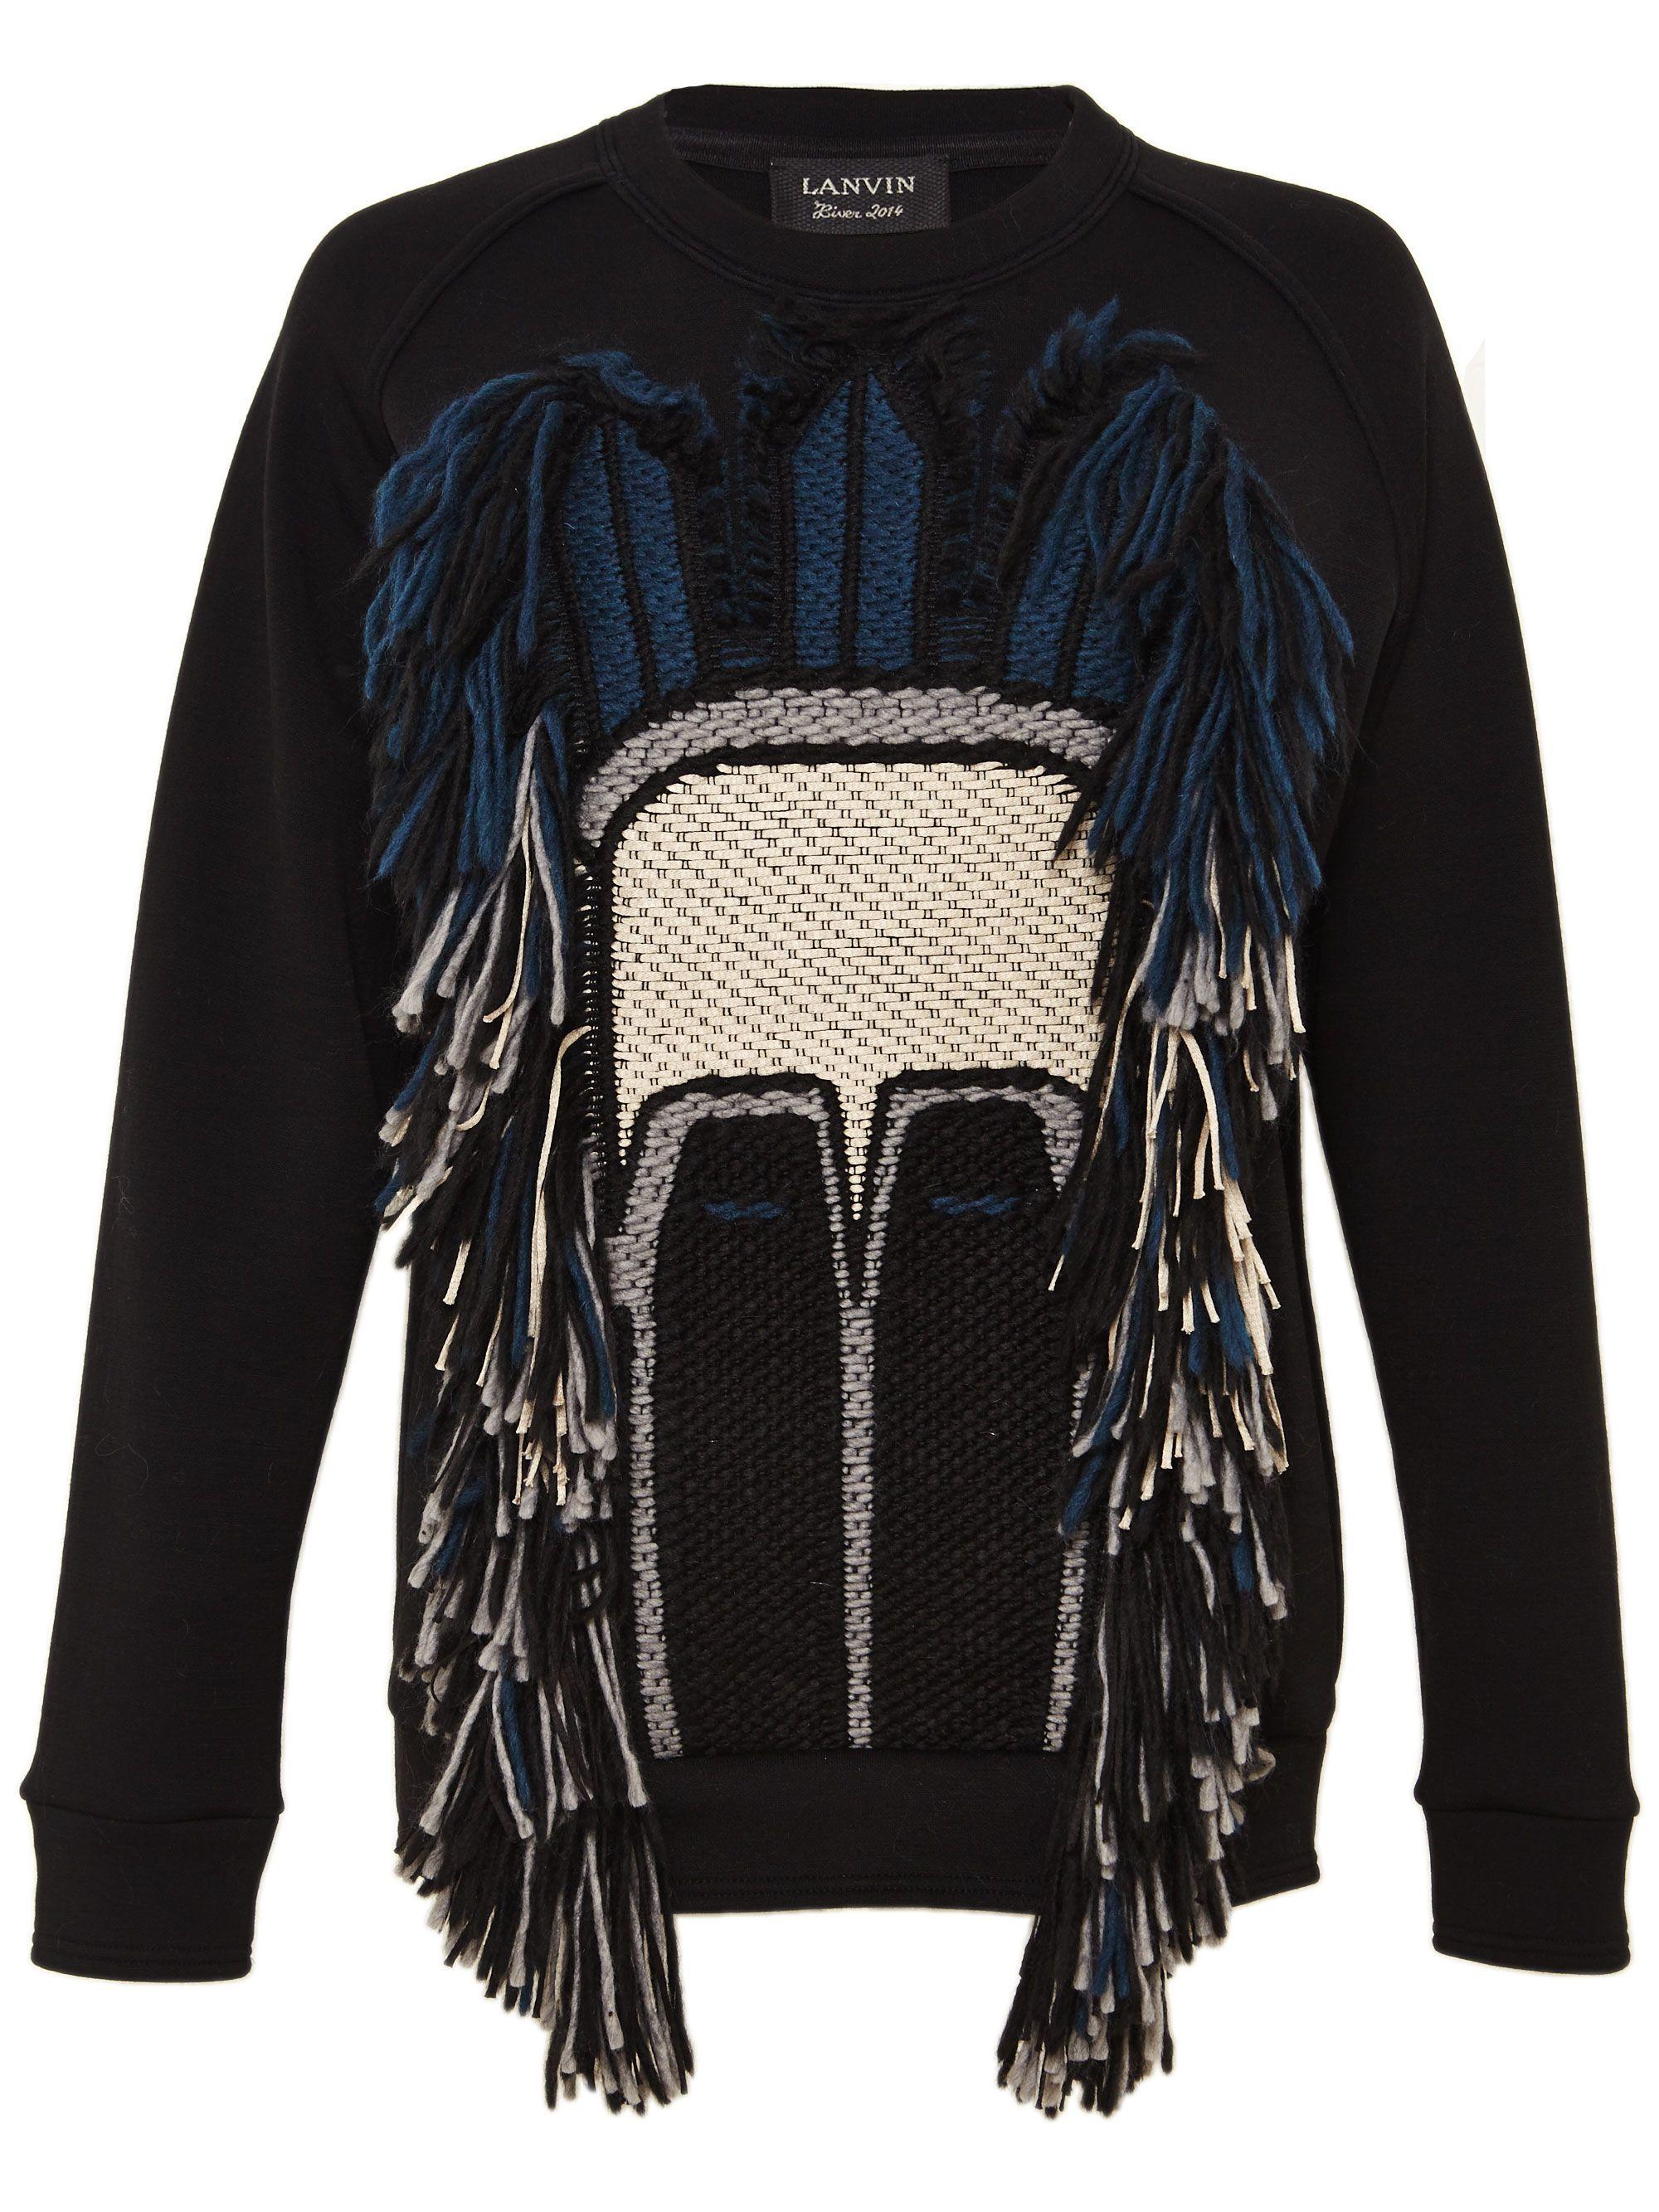 Lanvin Womens Tribal Sweatshirt | LN CC | Sweatshirts